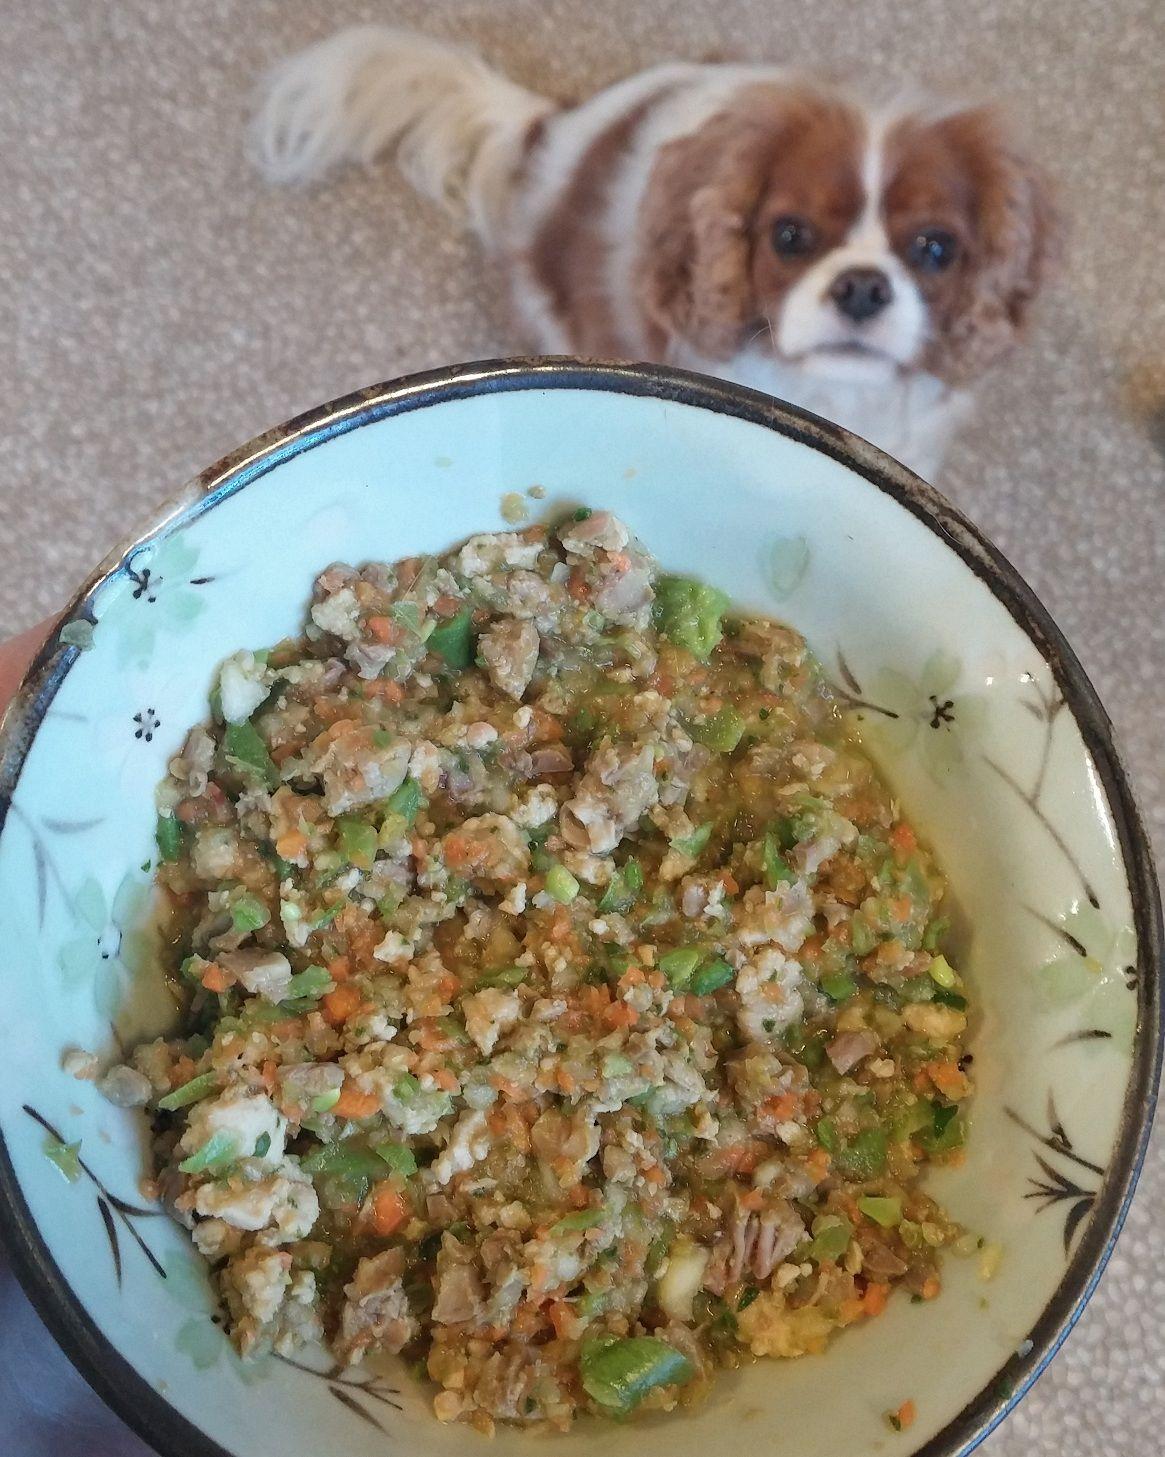 Grain-Free Homemade Dog Food